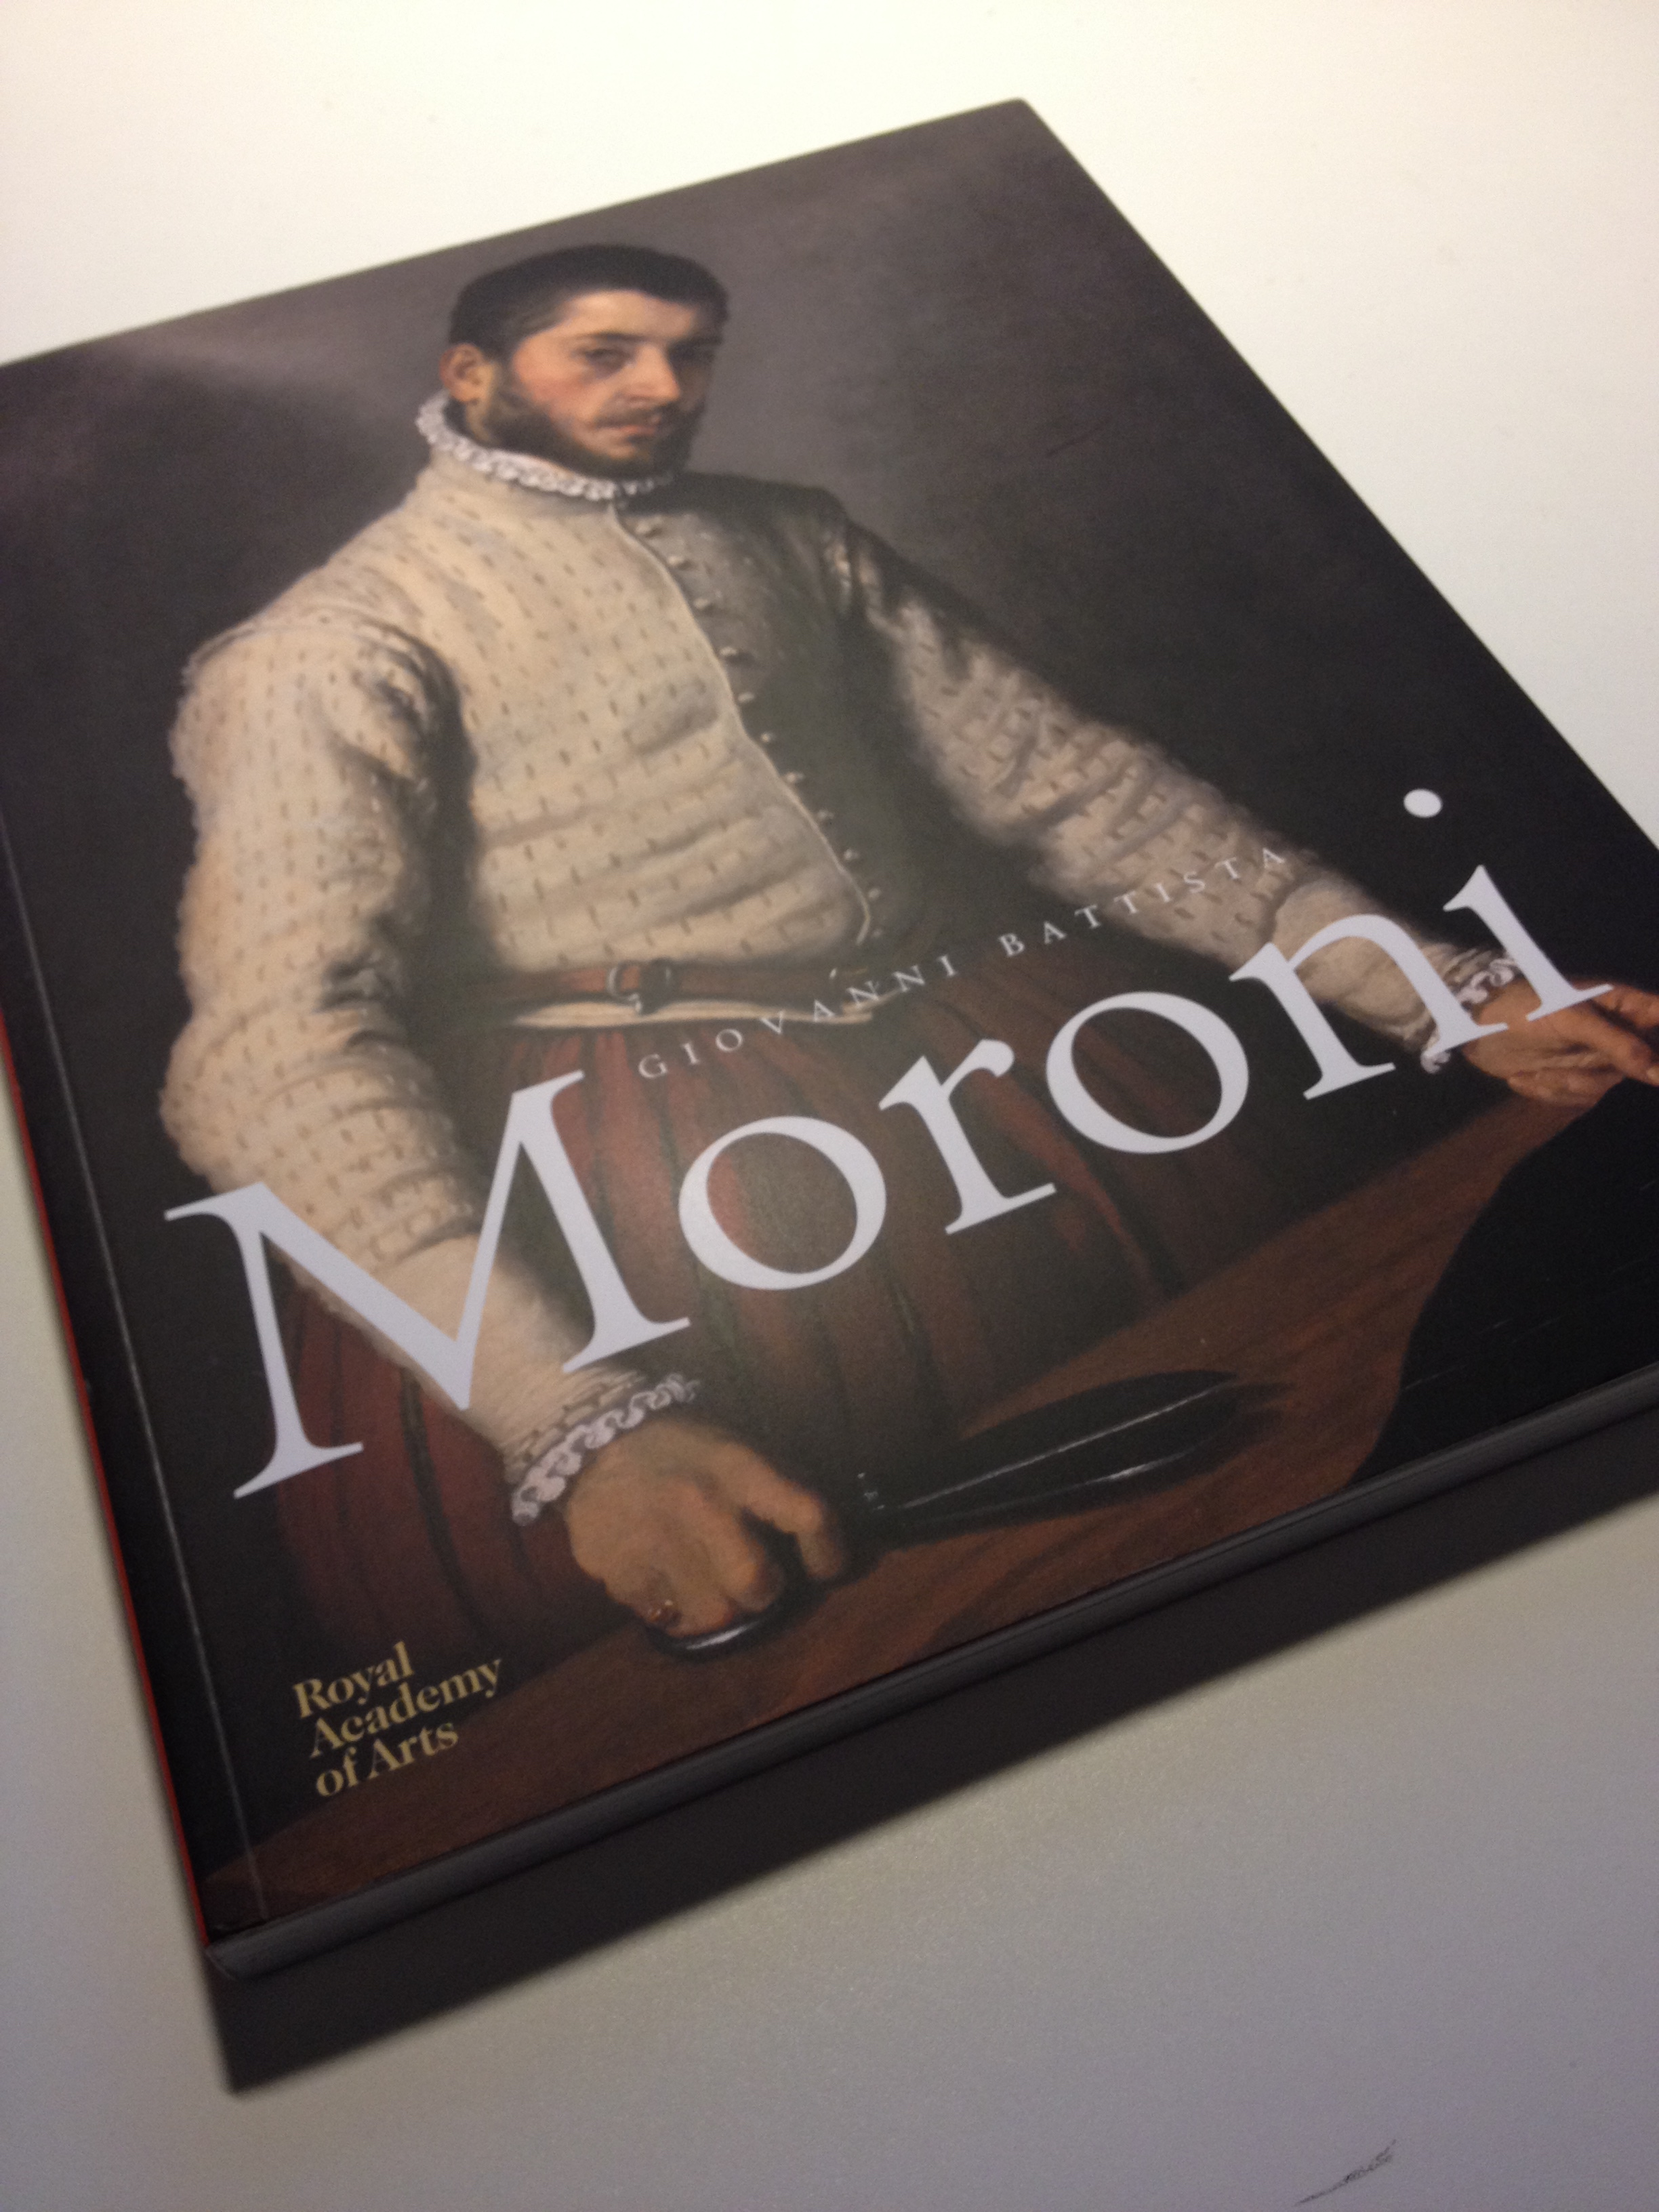 Moroni at the Royal Academy